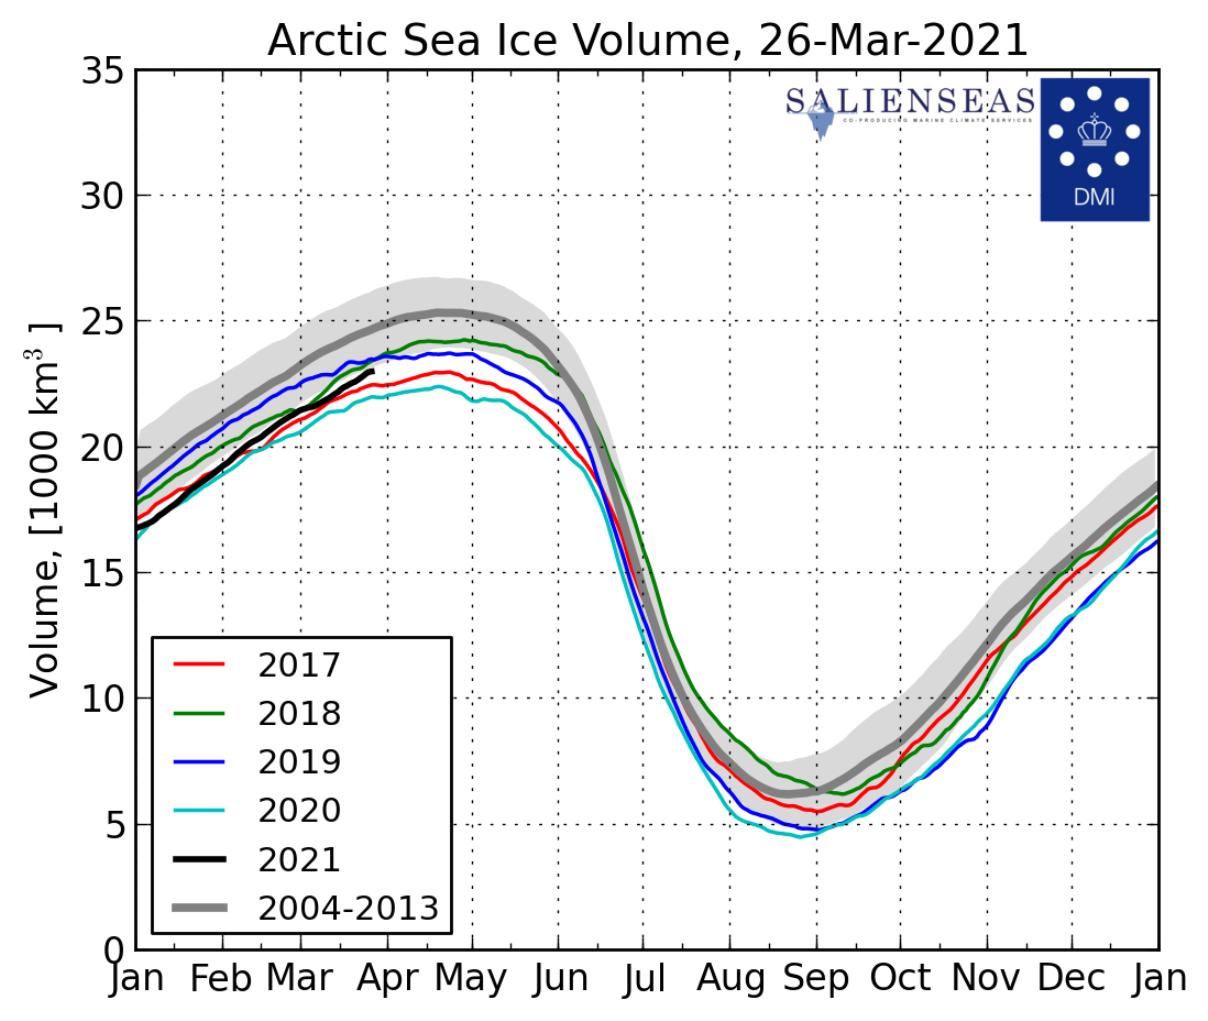 arctic-sea-ice-maximum-2021-melt-volume-analysis-graph